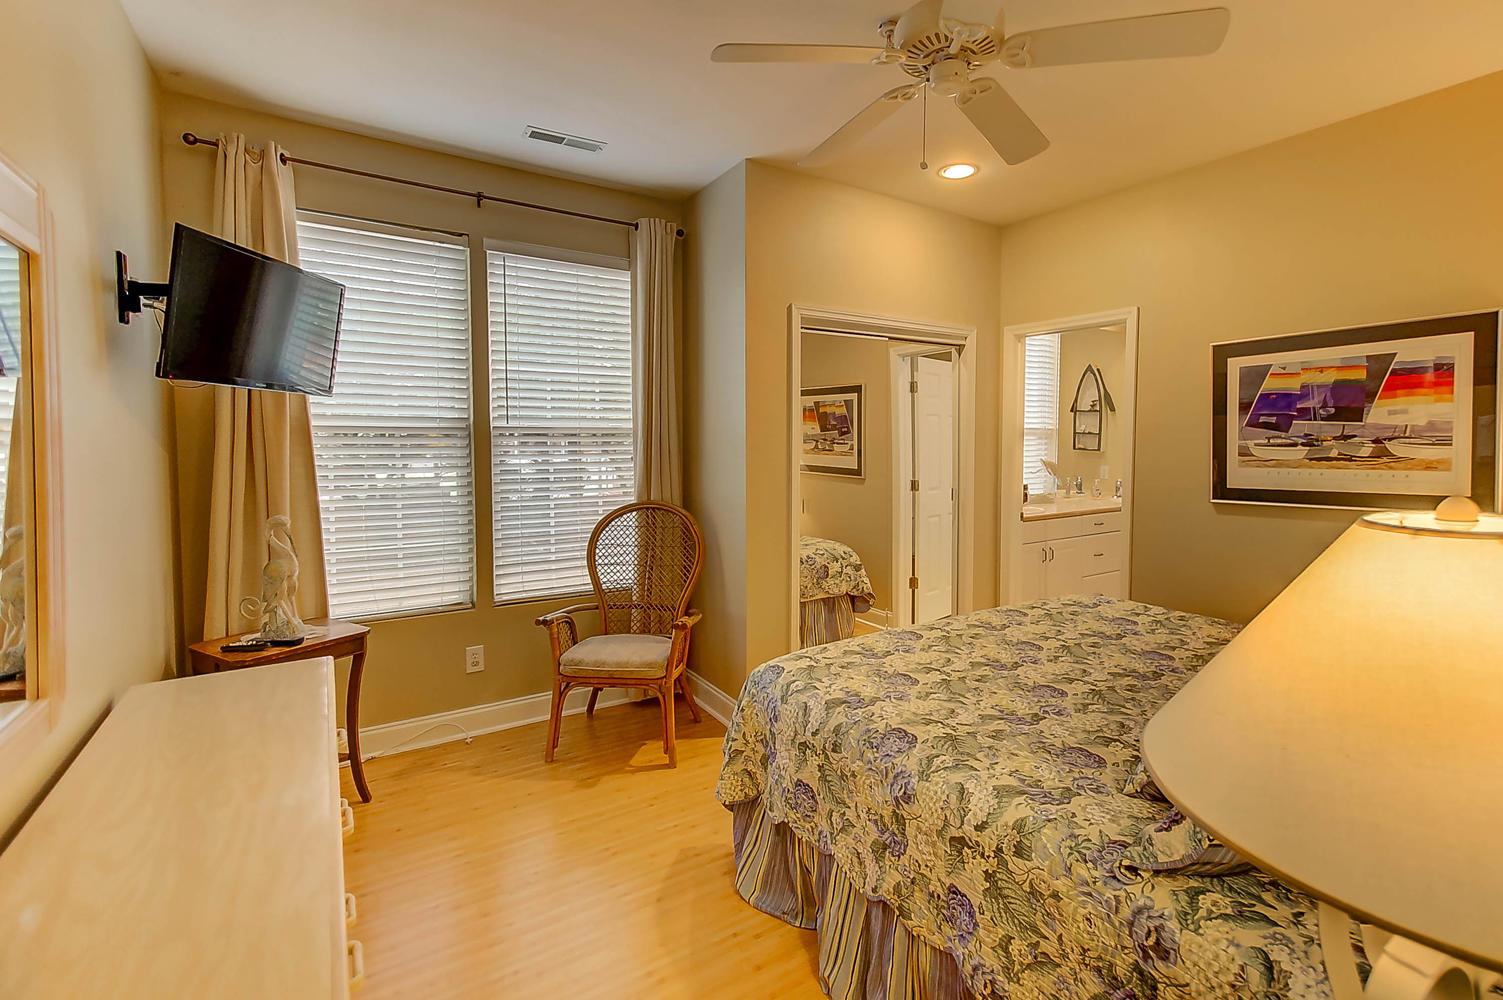 Beachwalker Villas Homes For Sale - 108 Ashley, Folly Beach, SC - 10